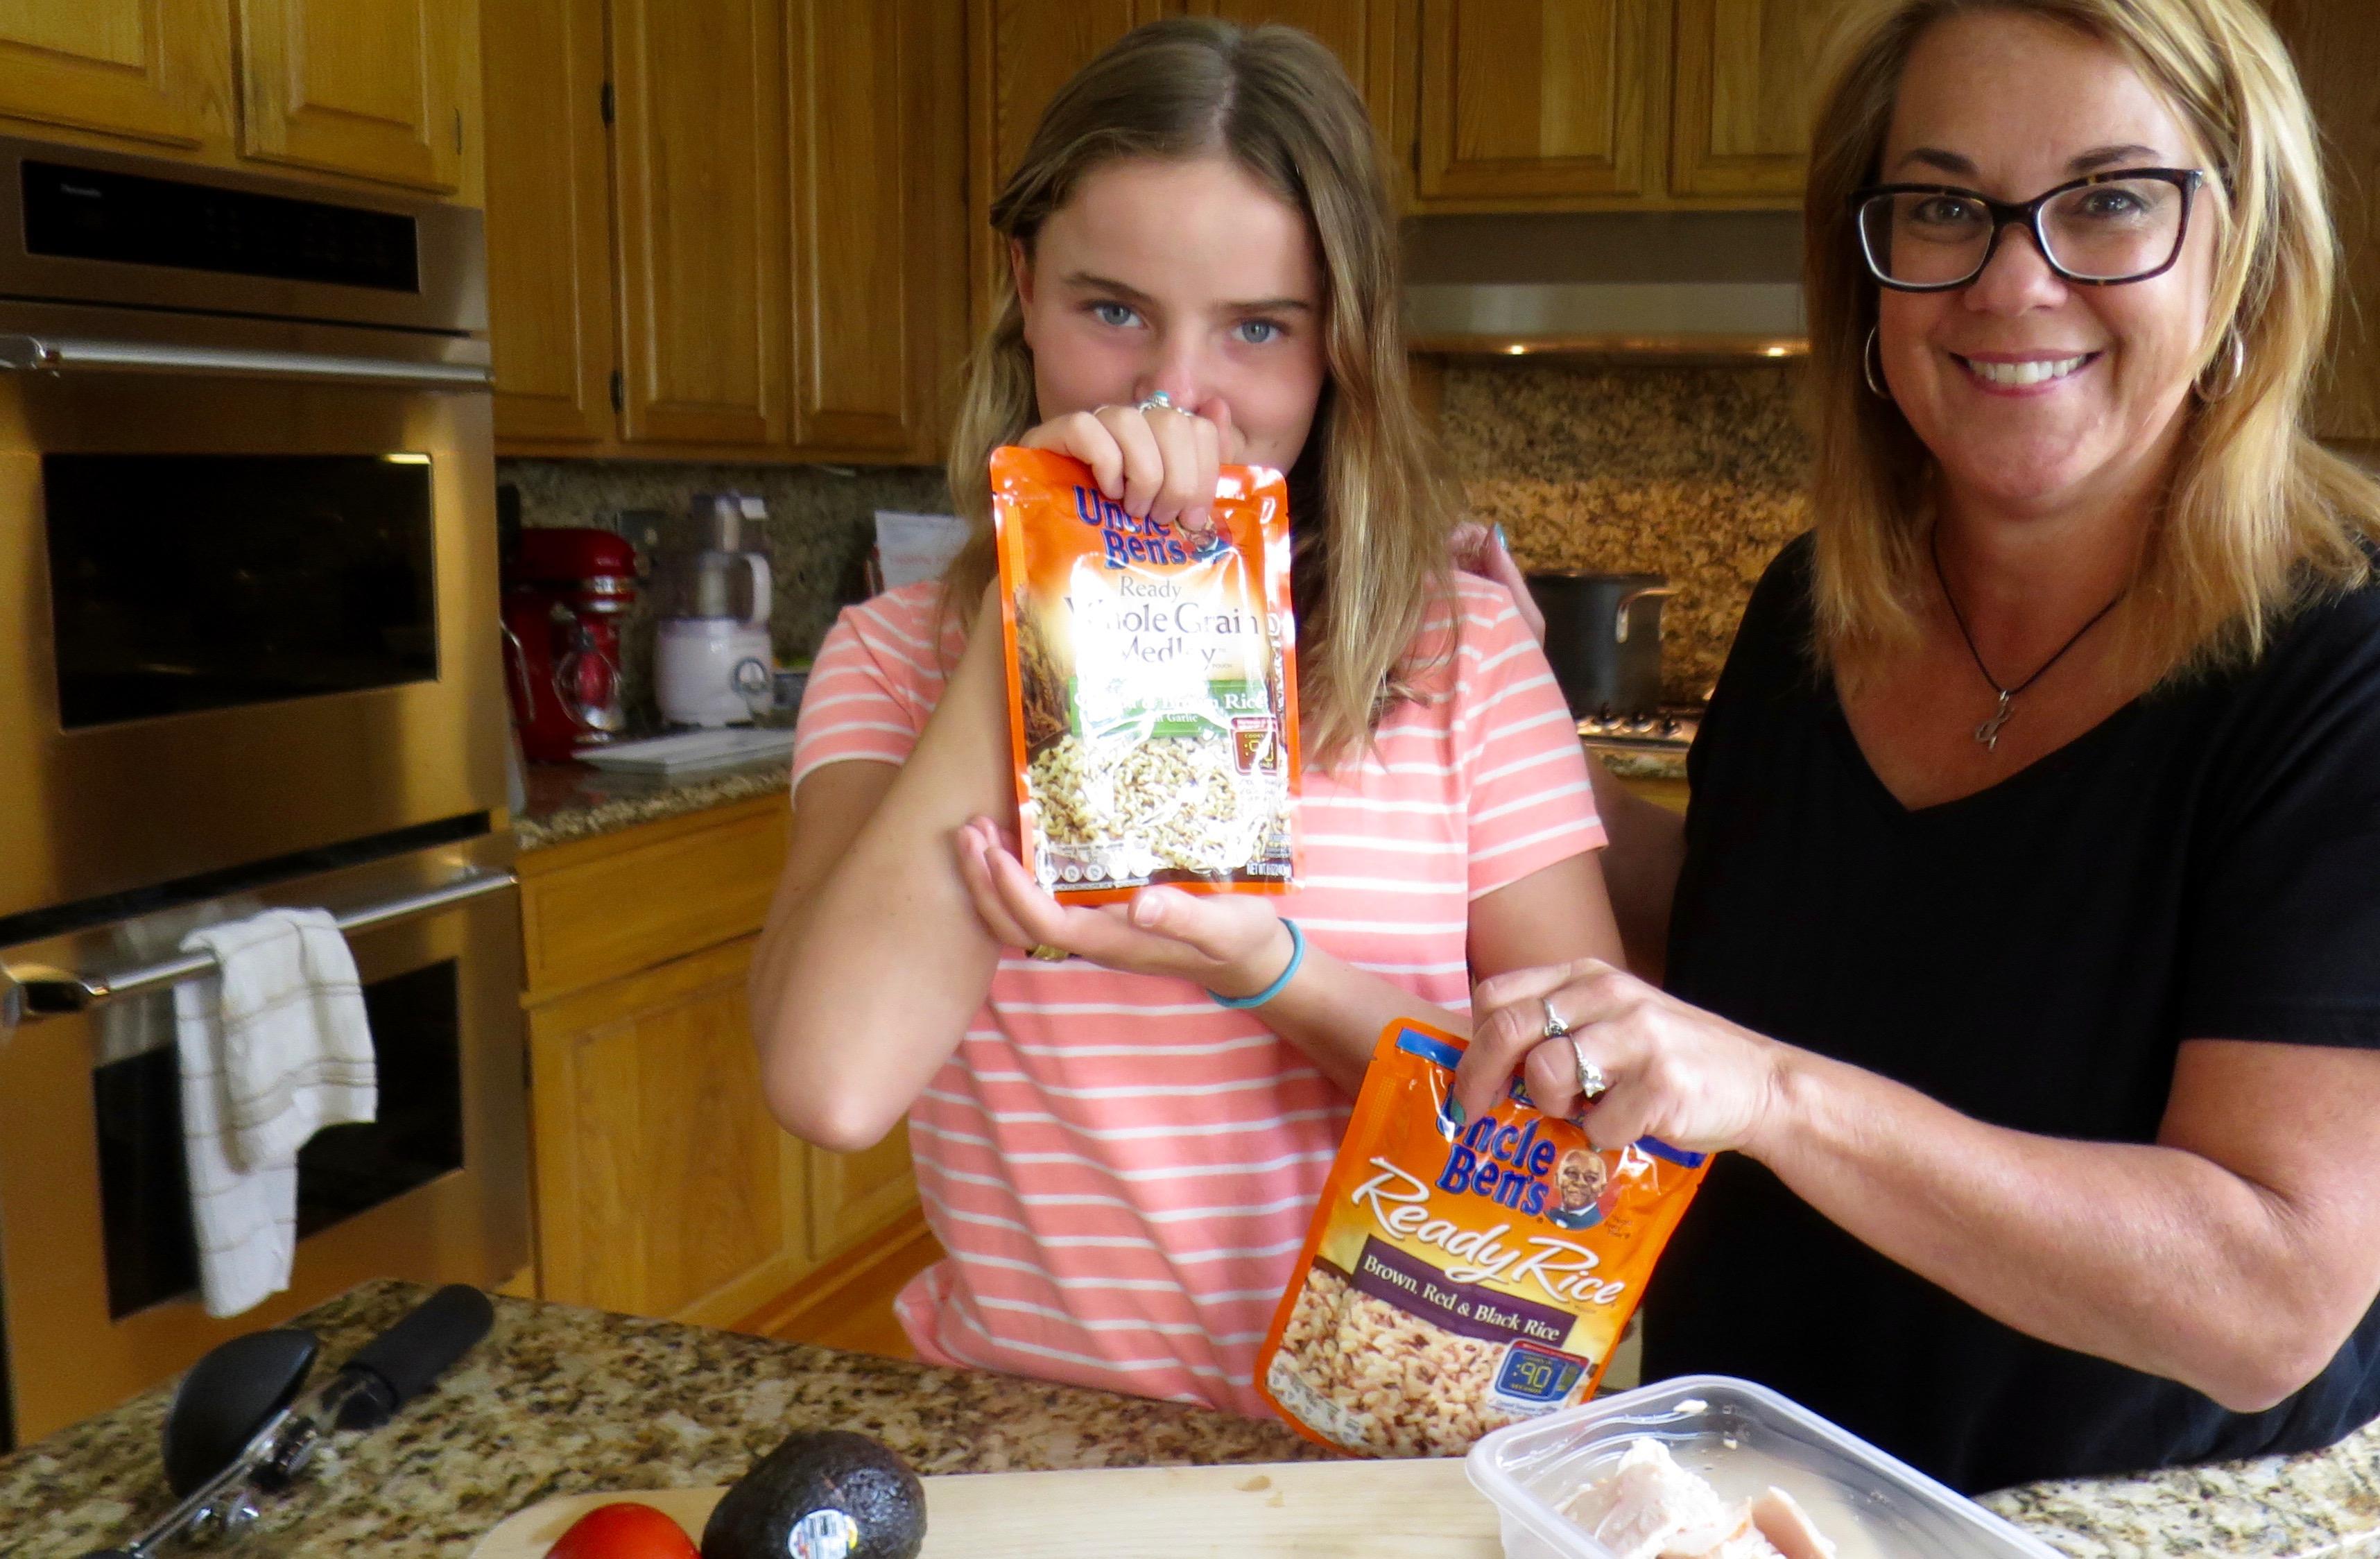 Carnival Rice Recipe #BensBeginners #UncleBensPromo